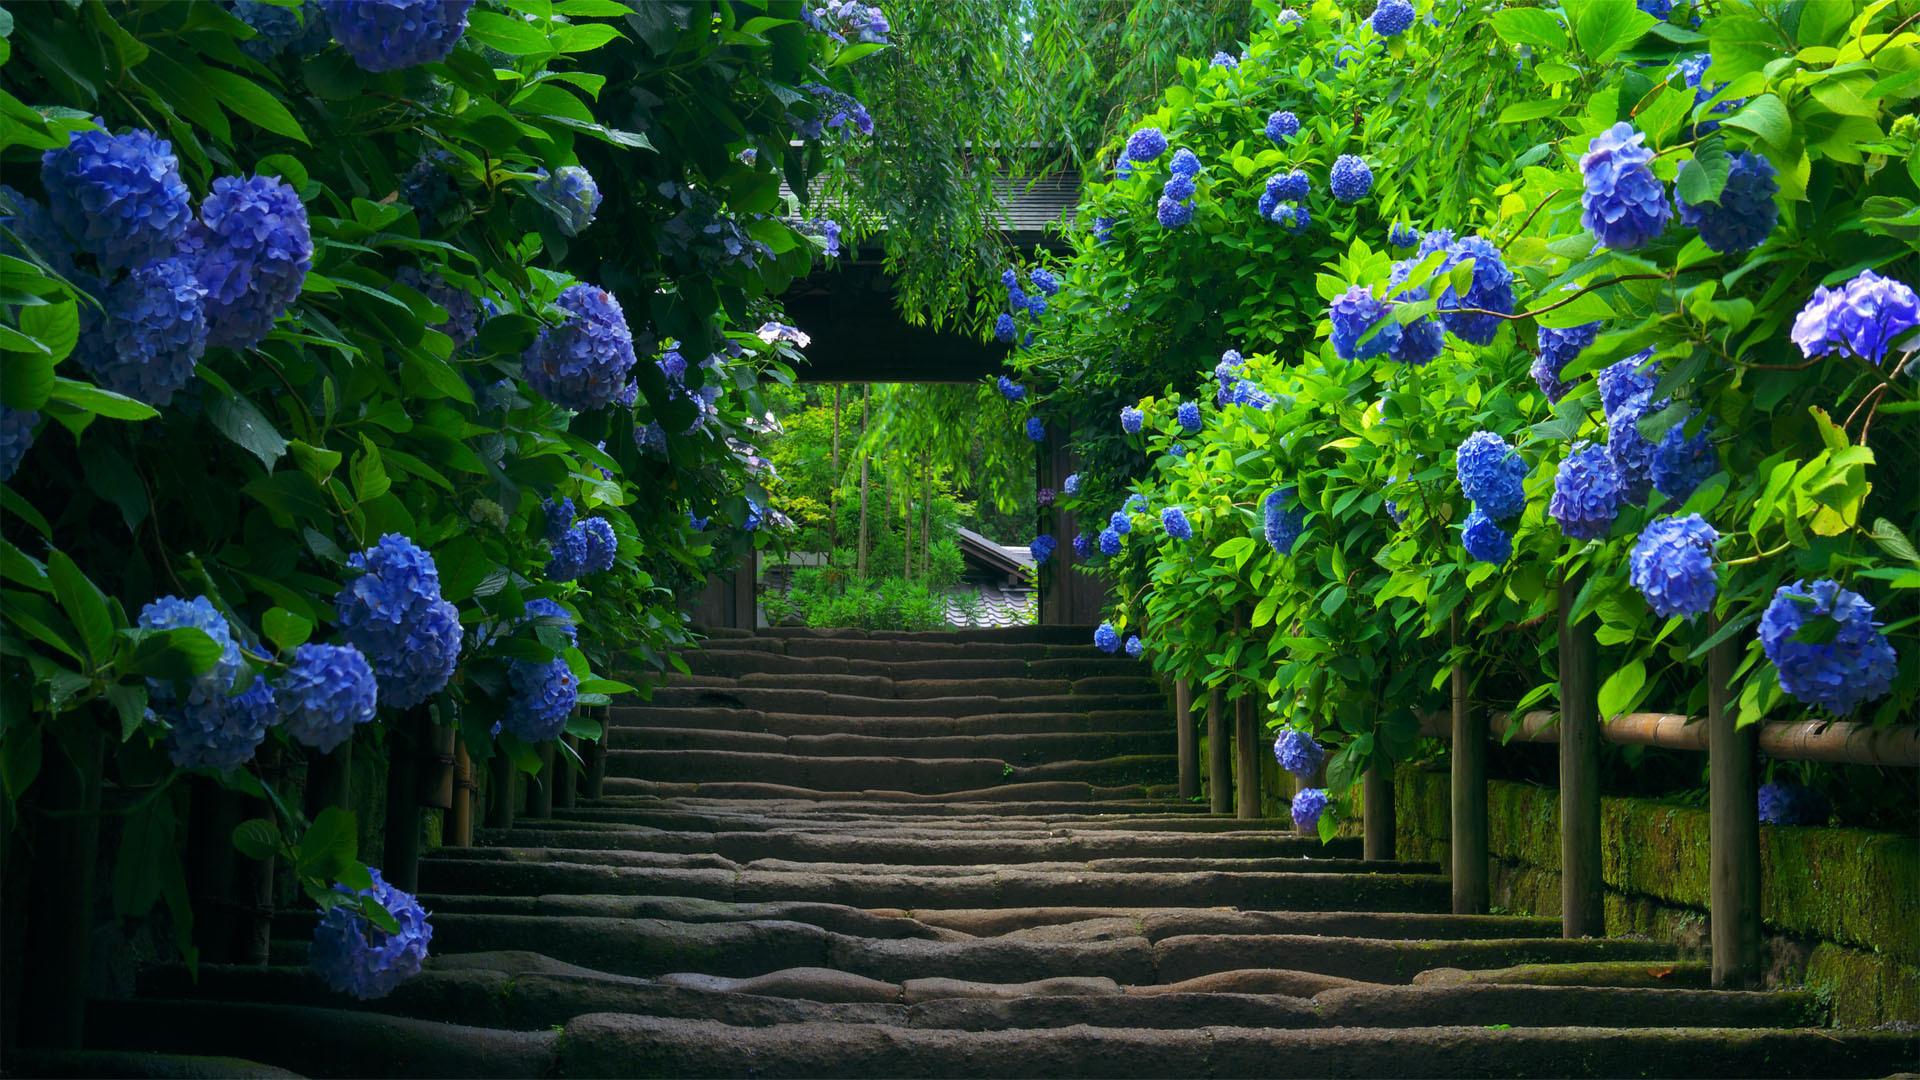 Wallpaper download garden - Flower Garden Nature Hd Dekstop Wallpaper Download This Wallpaper For